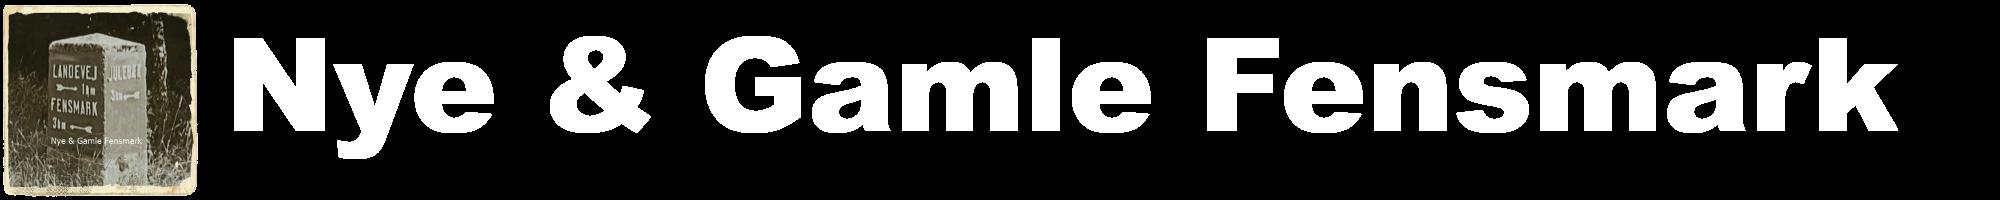 Nye & Gamle Fensmark logo